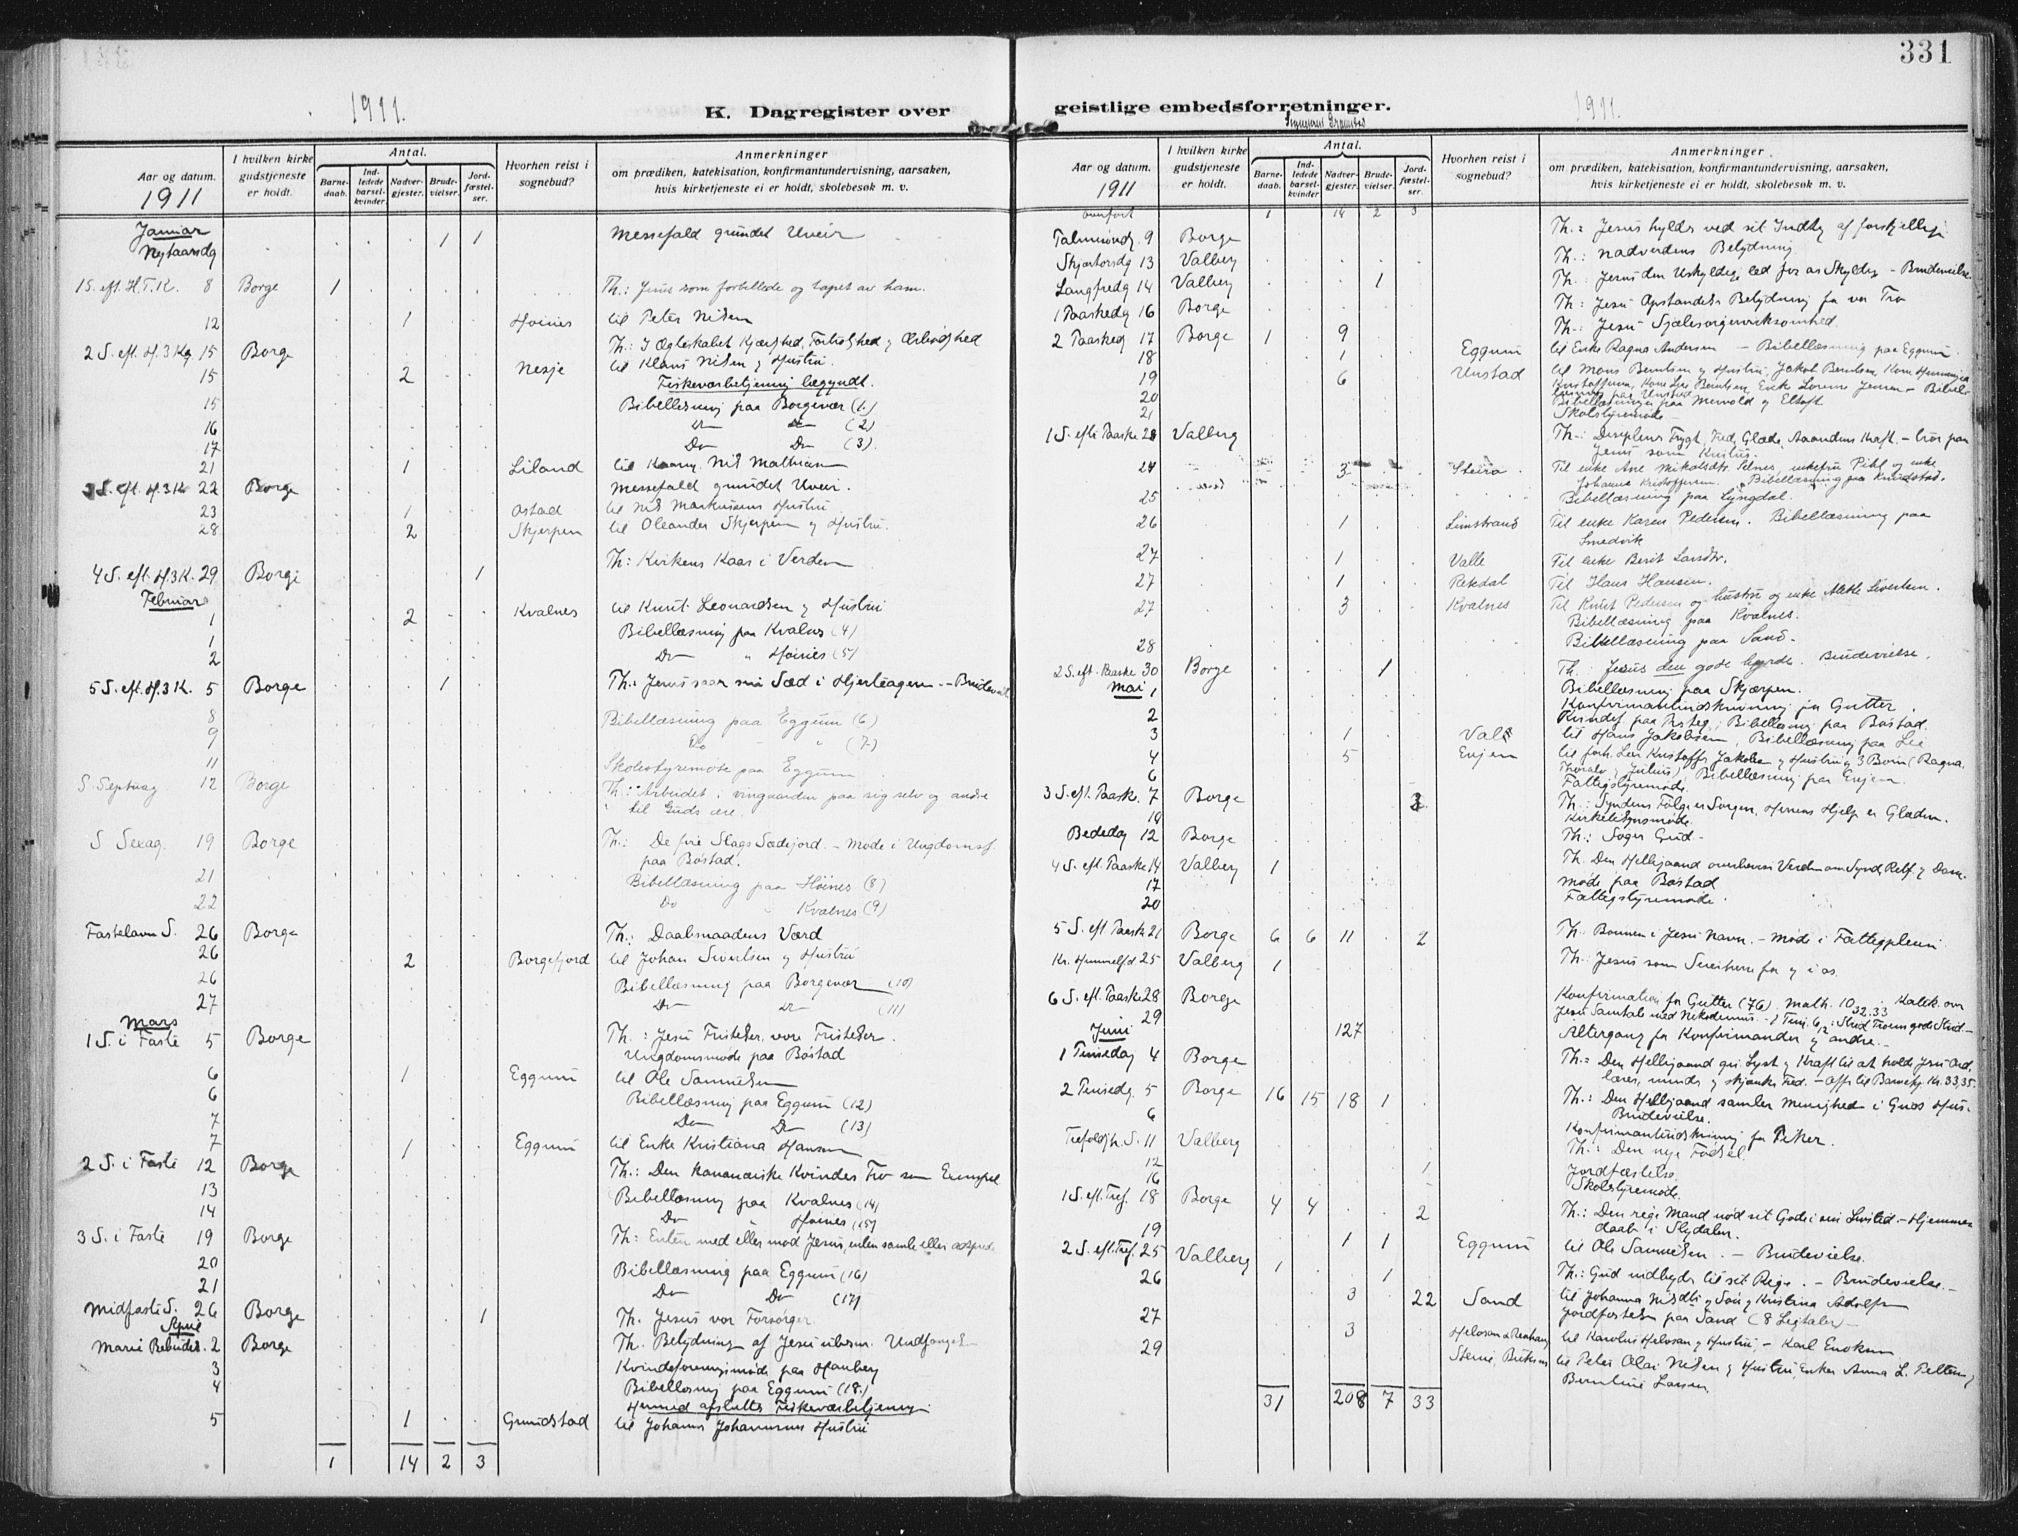 SAT, Ministerialprotokoller, klokkerbøker og fødselsregistre - Nordland, 880/L1135: Ministerialbok nr. 880A09, 1908-1919, s. 331